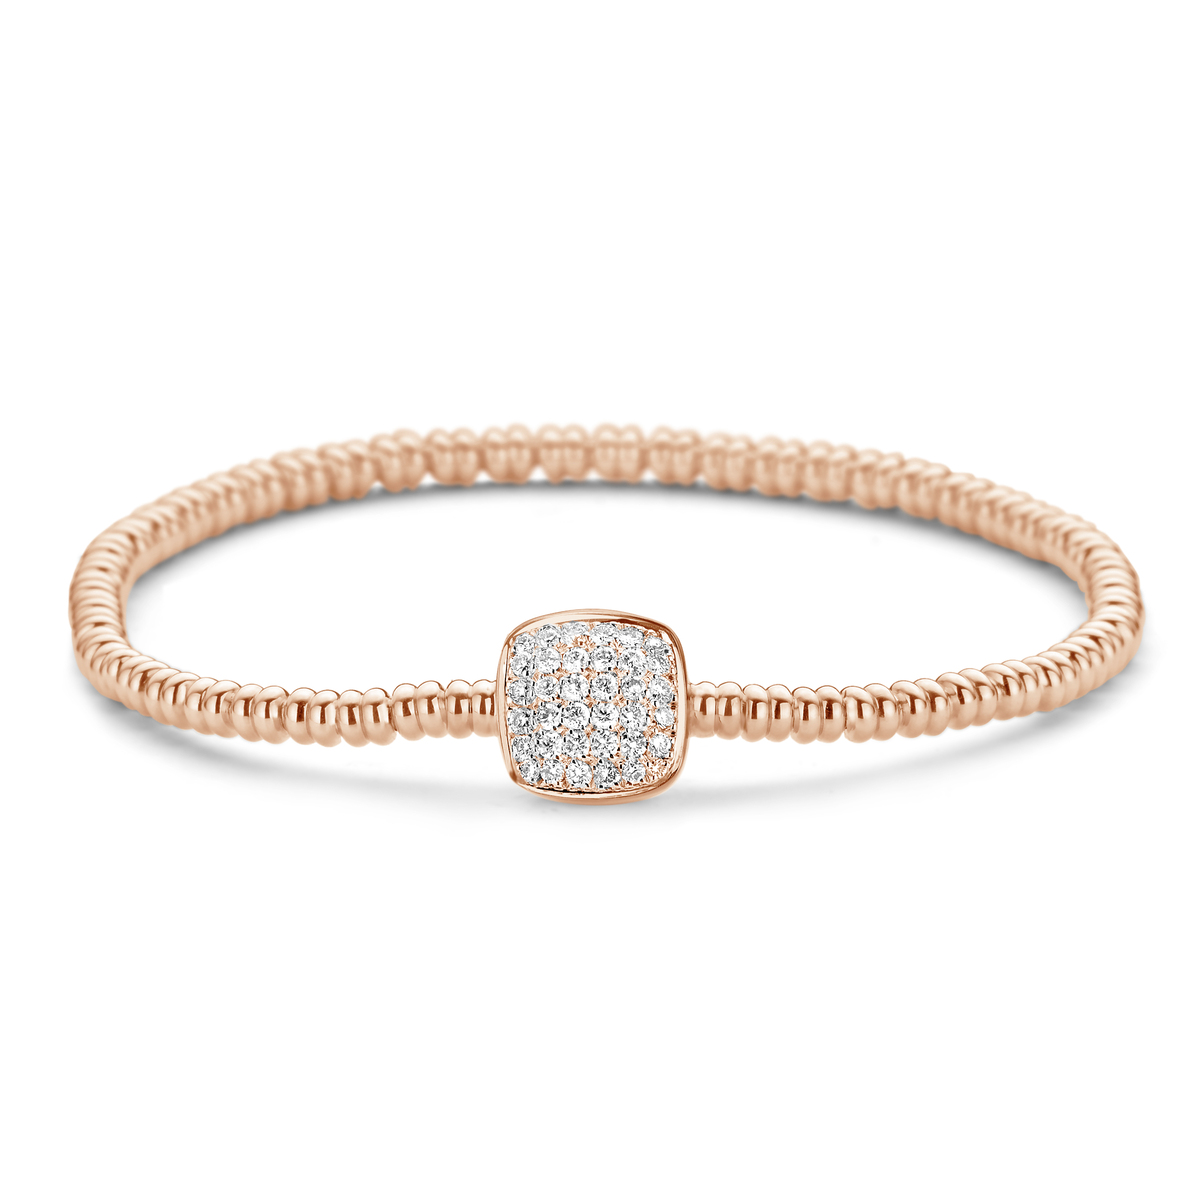 vulsini bracelet in rose gold